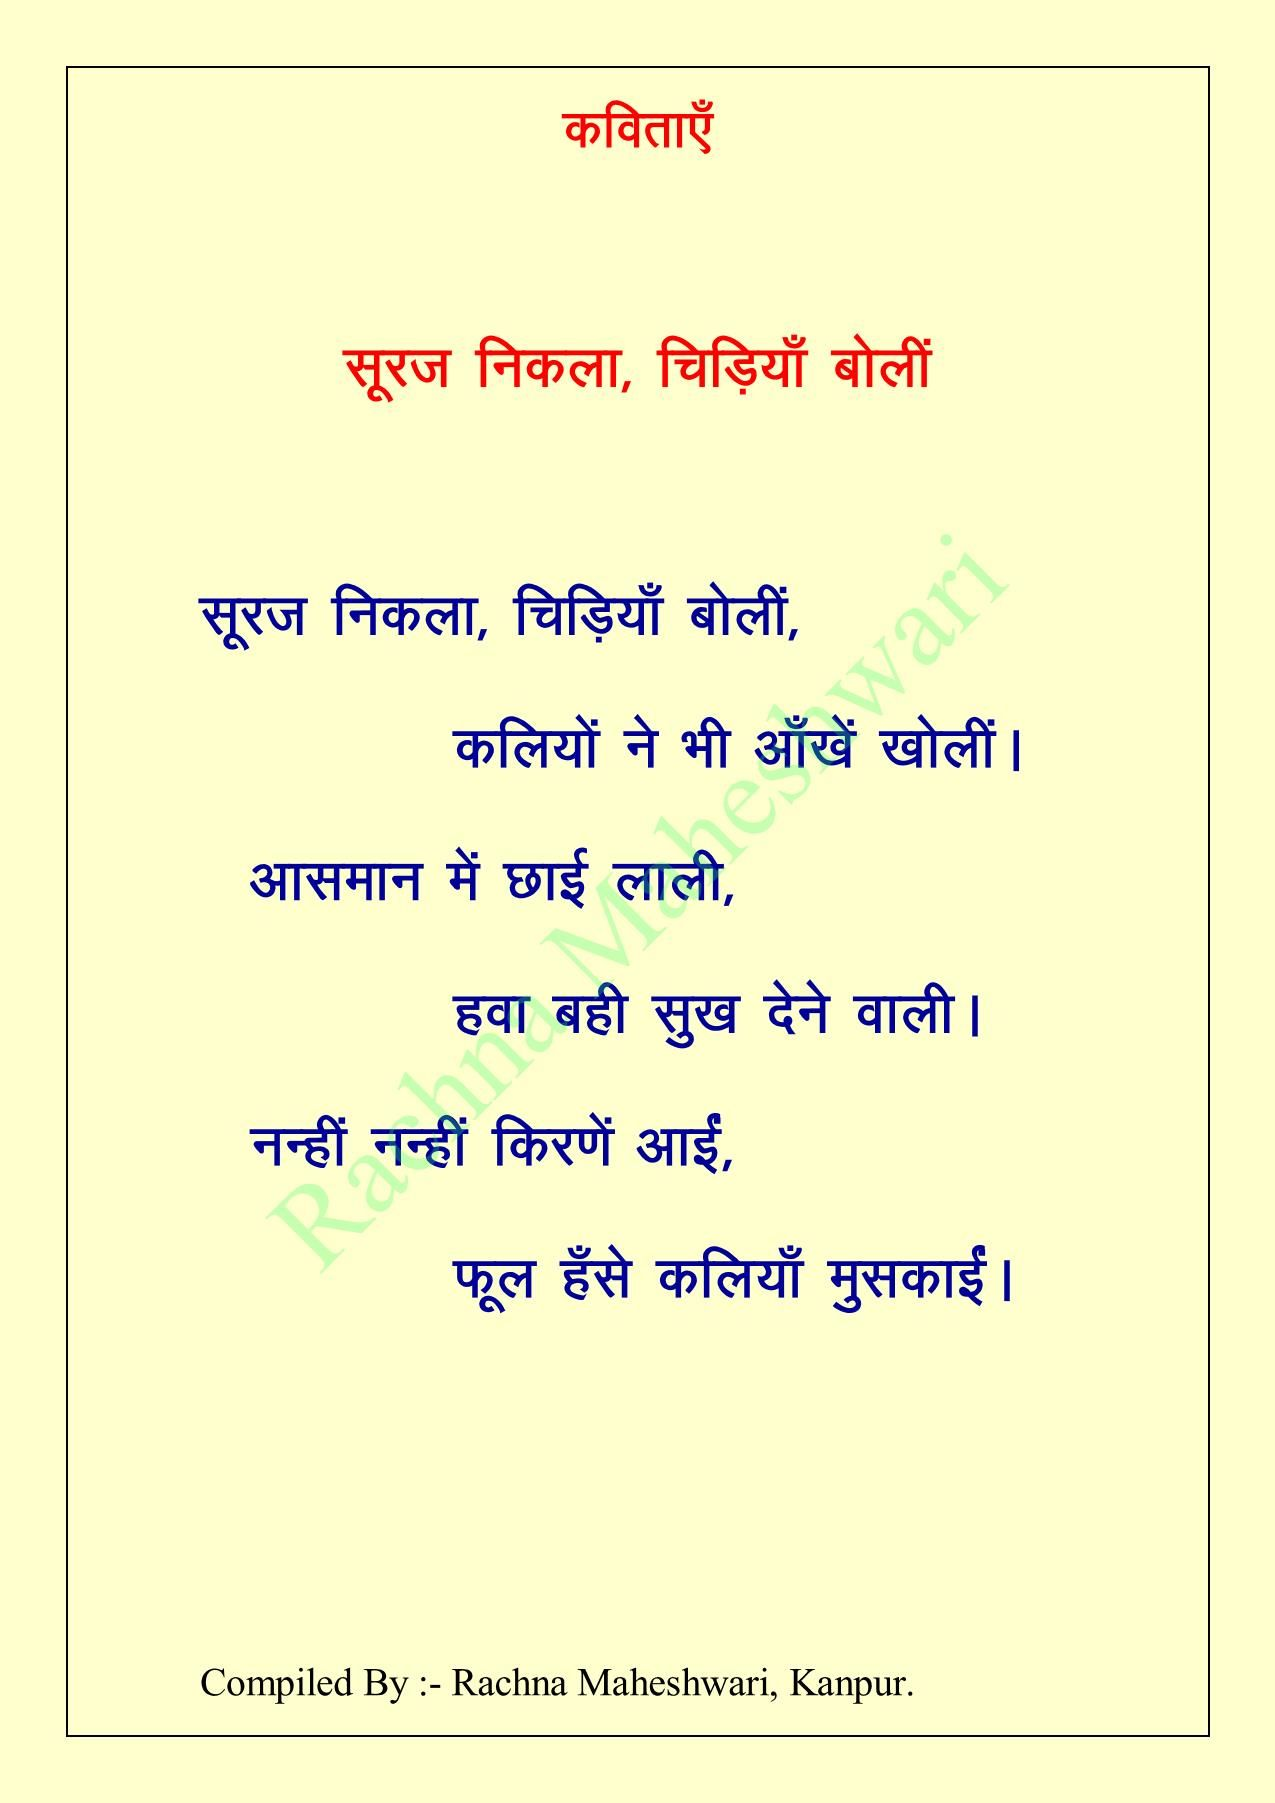 Pin By Priti Singh On Hindi For Kids Pinterest Handwriting